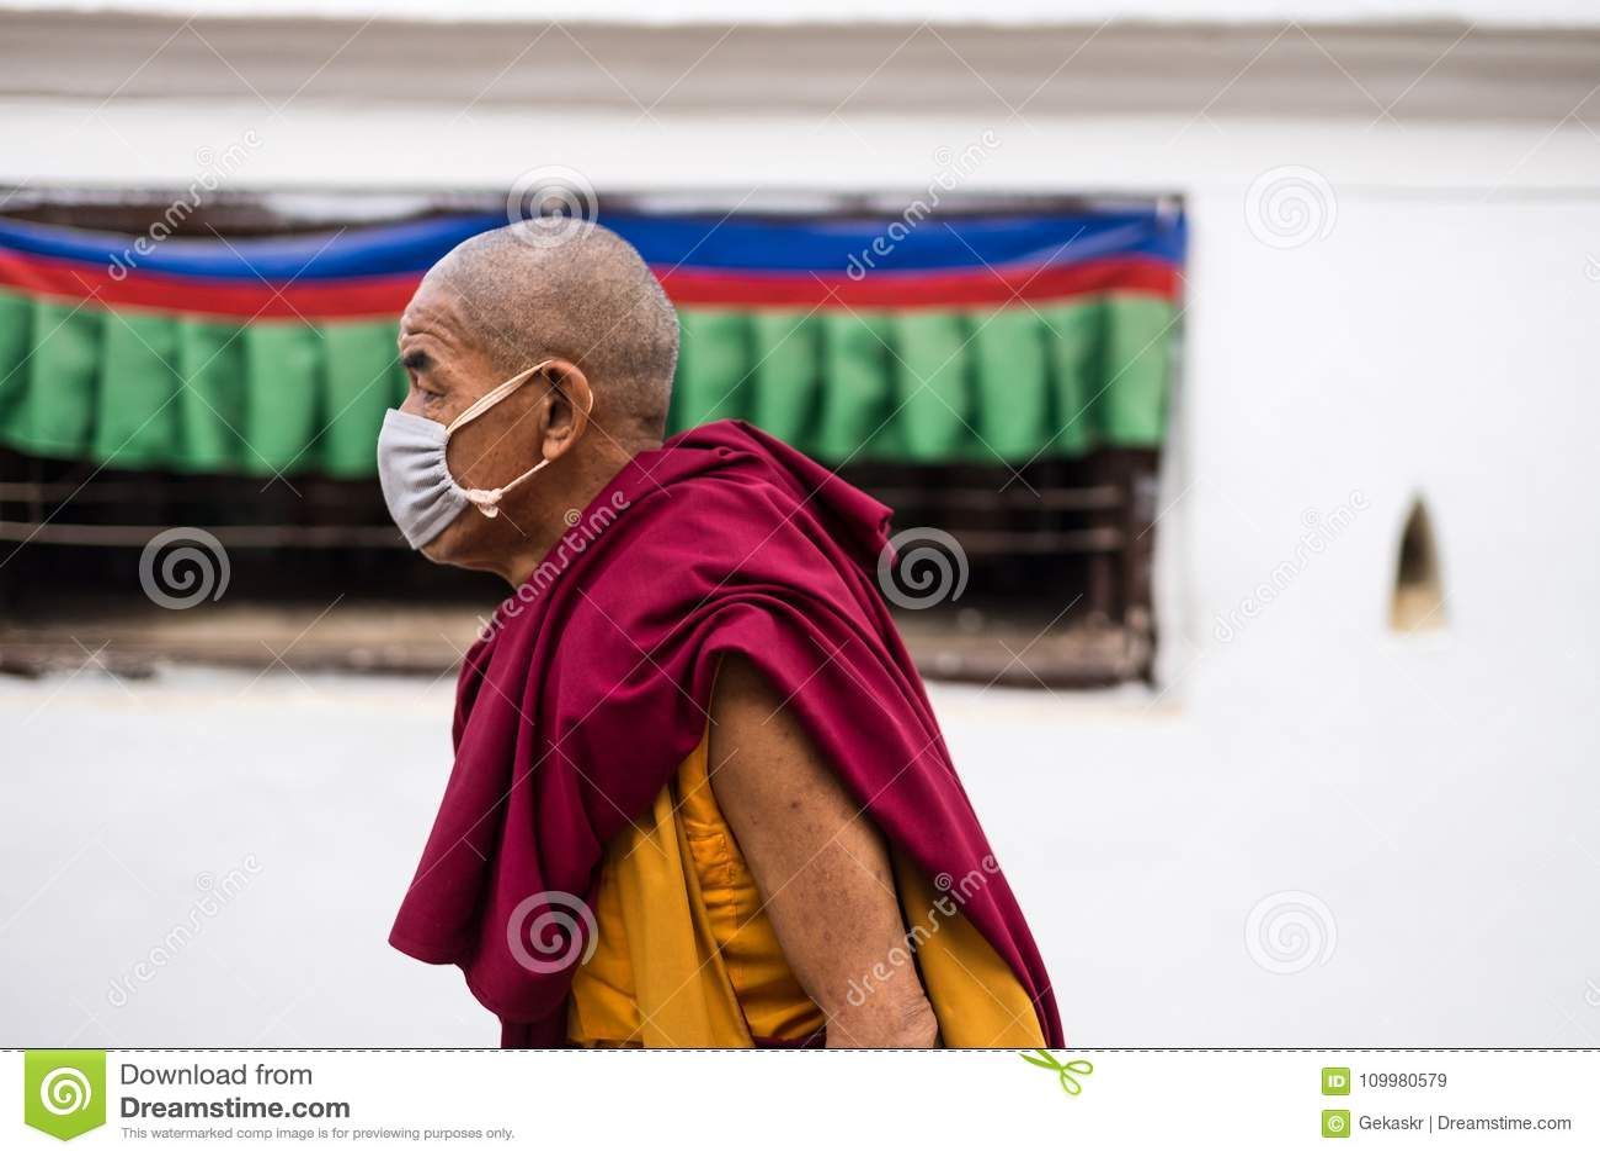 Portrait of a man on the streets of Kathmandu near Buddhist temple